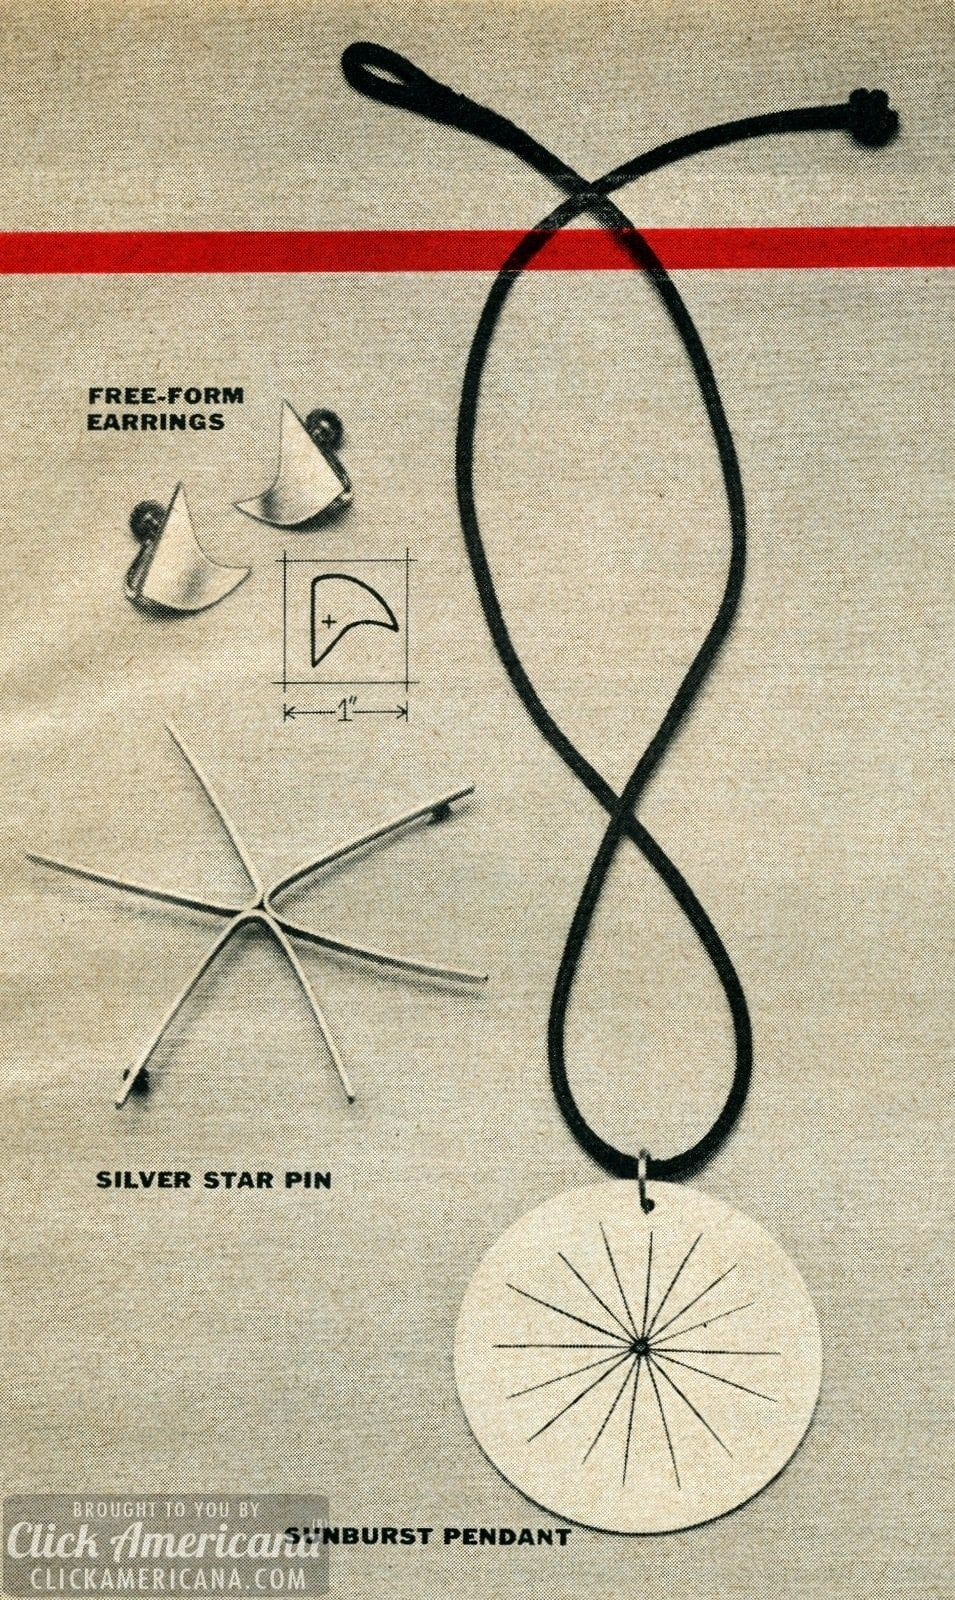 50s style jewelry